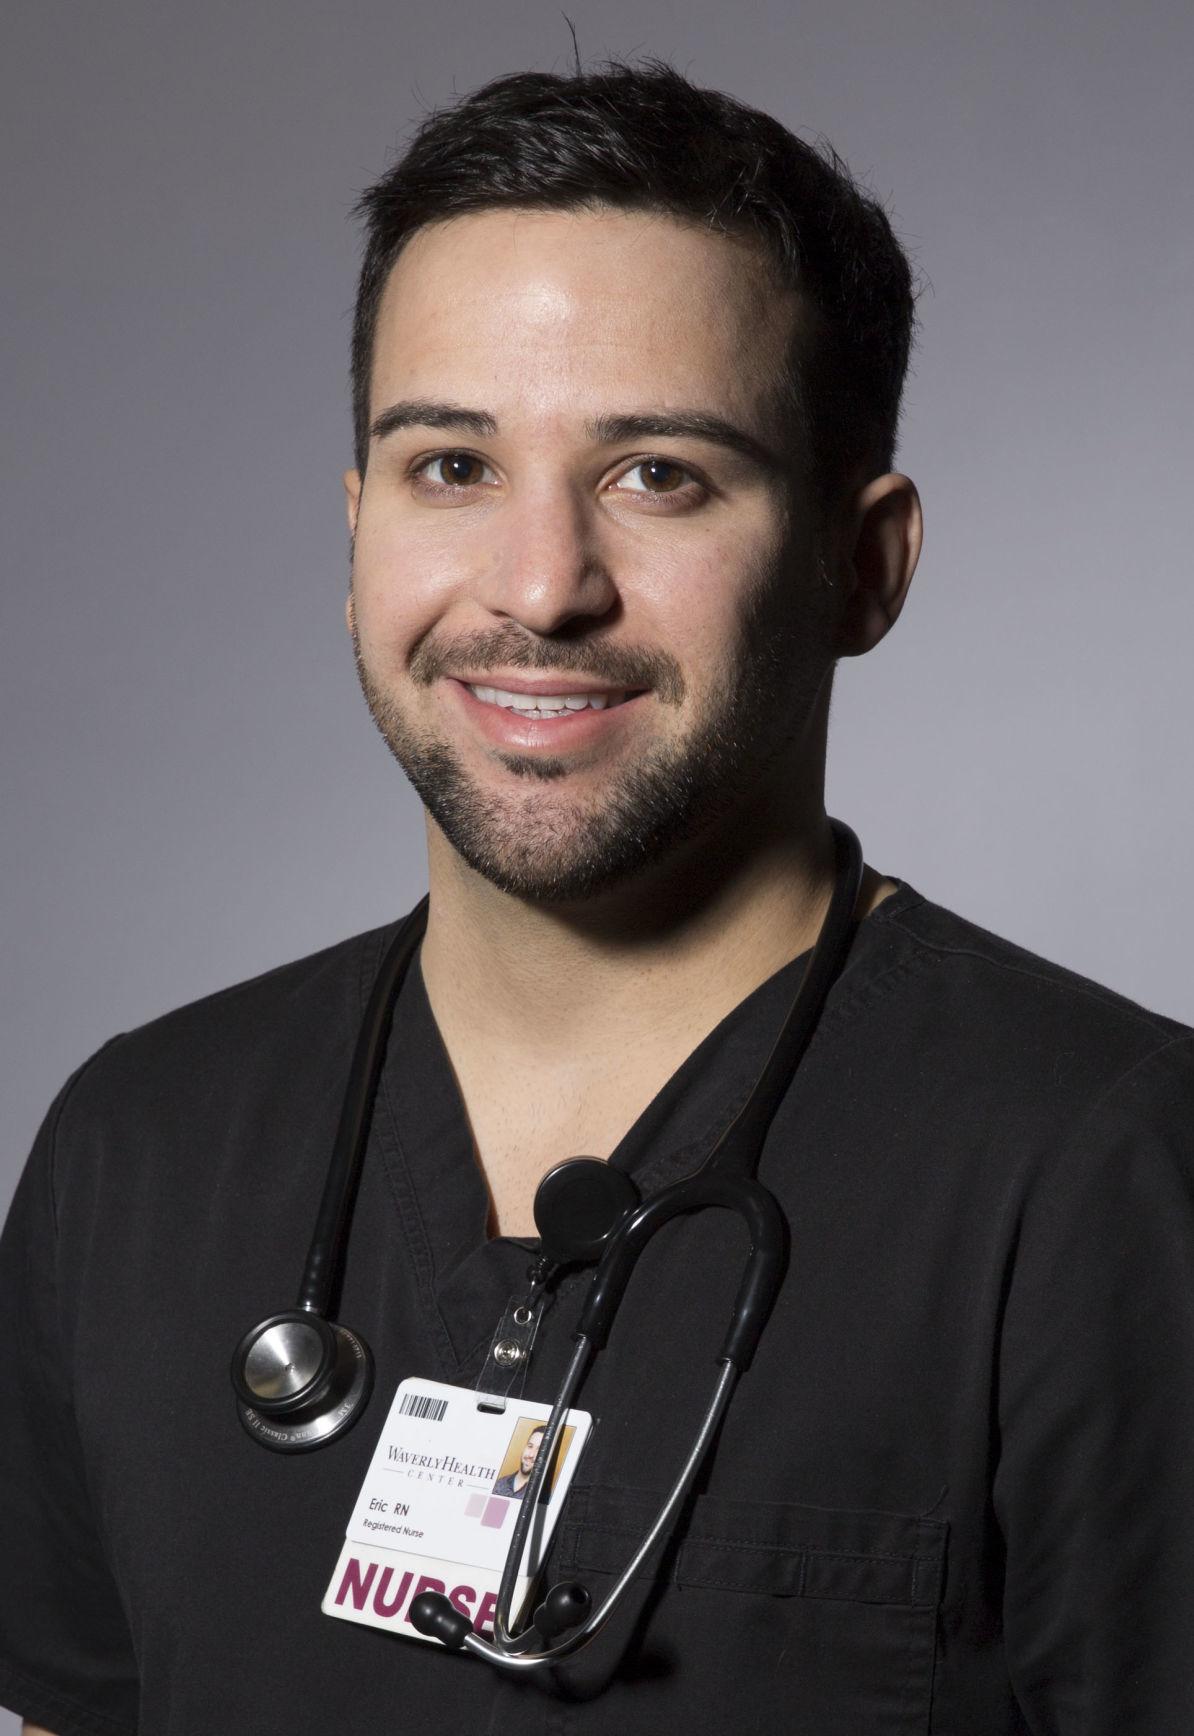 032519kw-nurse-Eric Alberts-headshot-01